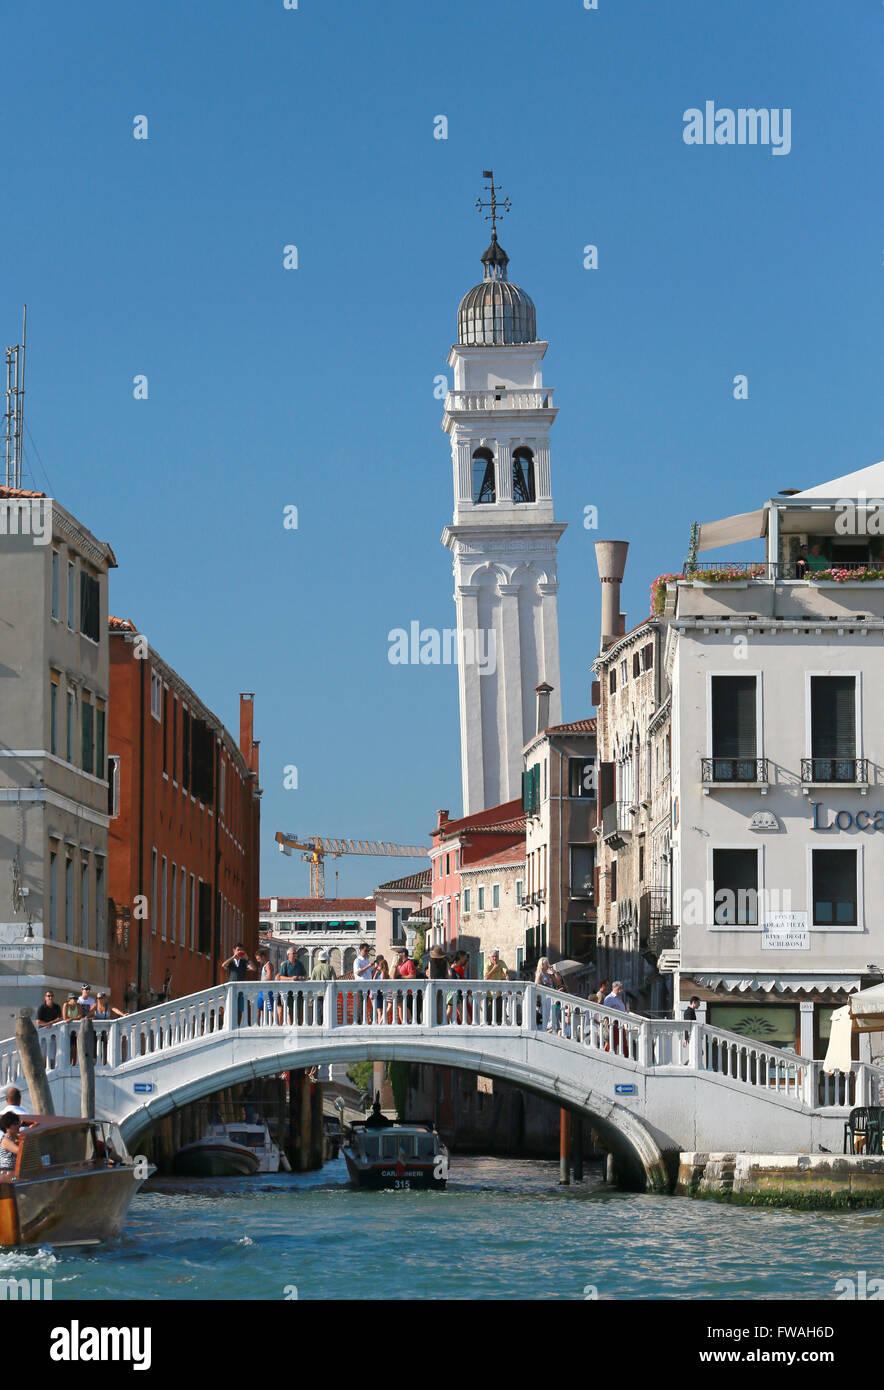 Ponte del la Pieta and Hellenic Institute belltower, Venice, Italy. - Stock Image